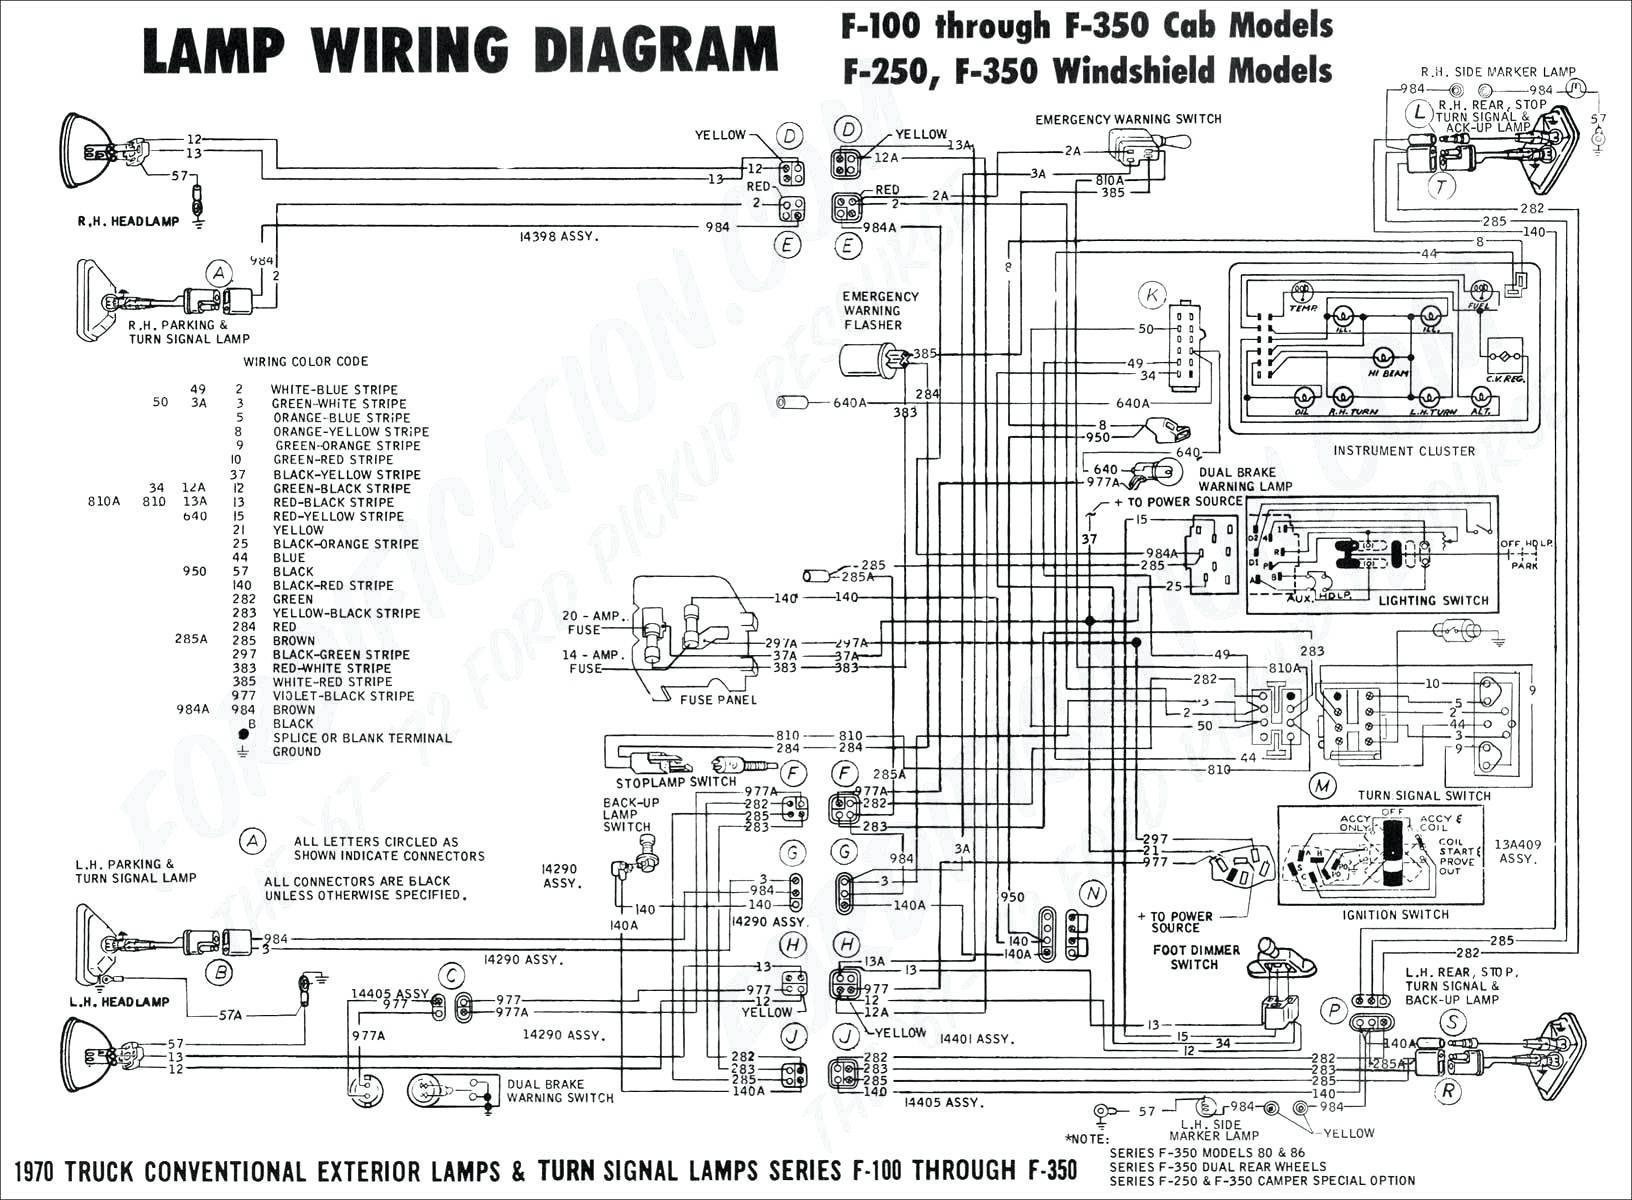 Plymouth Voyager Engine Diagram Chrysler Voyager